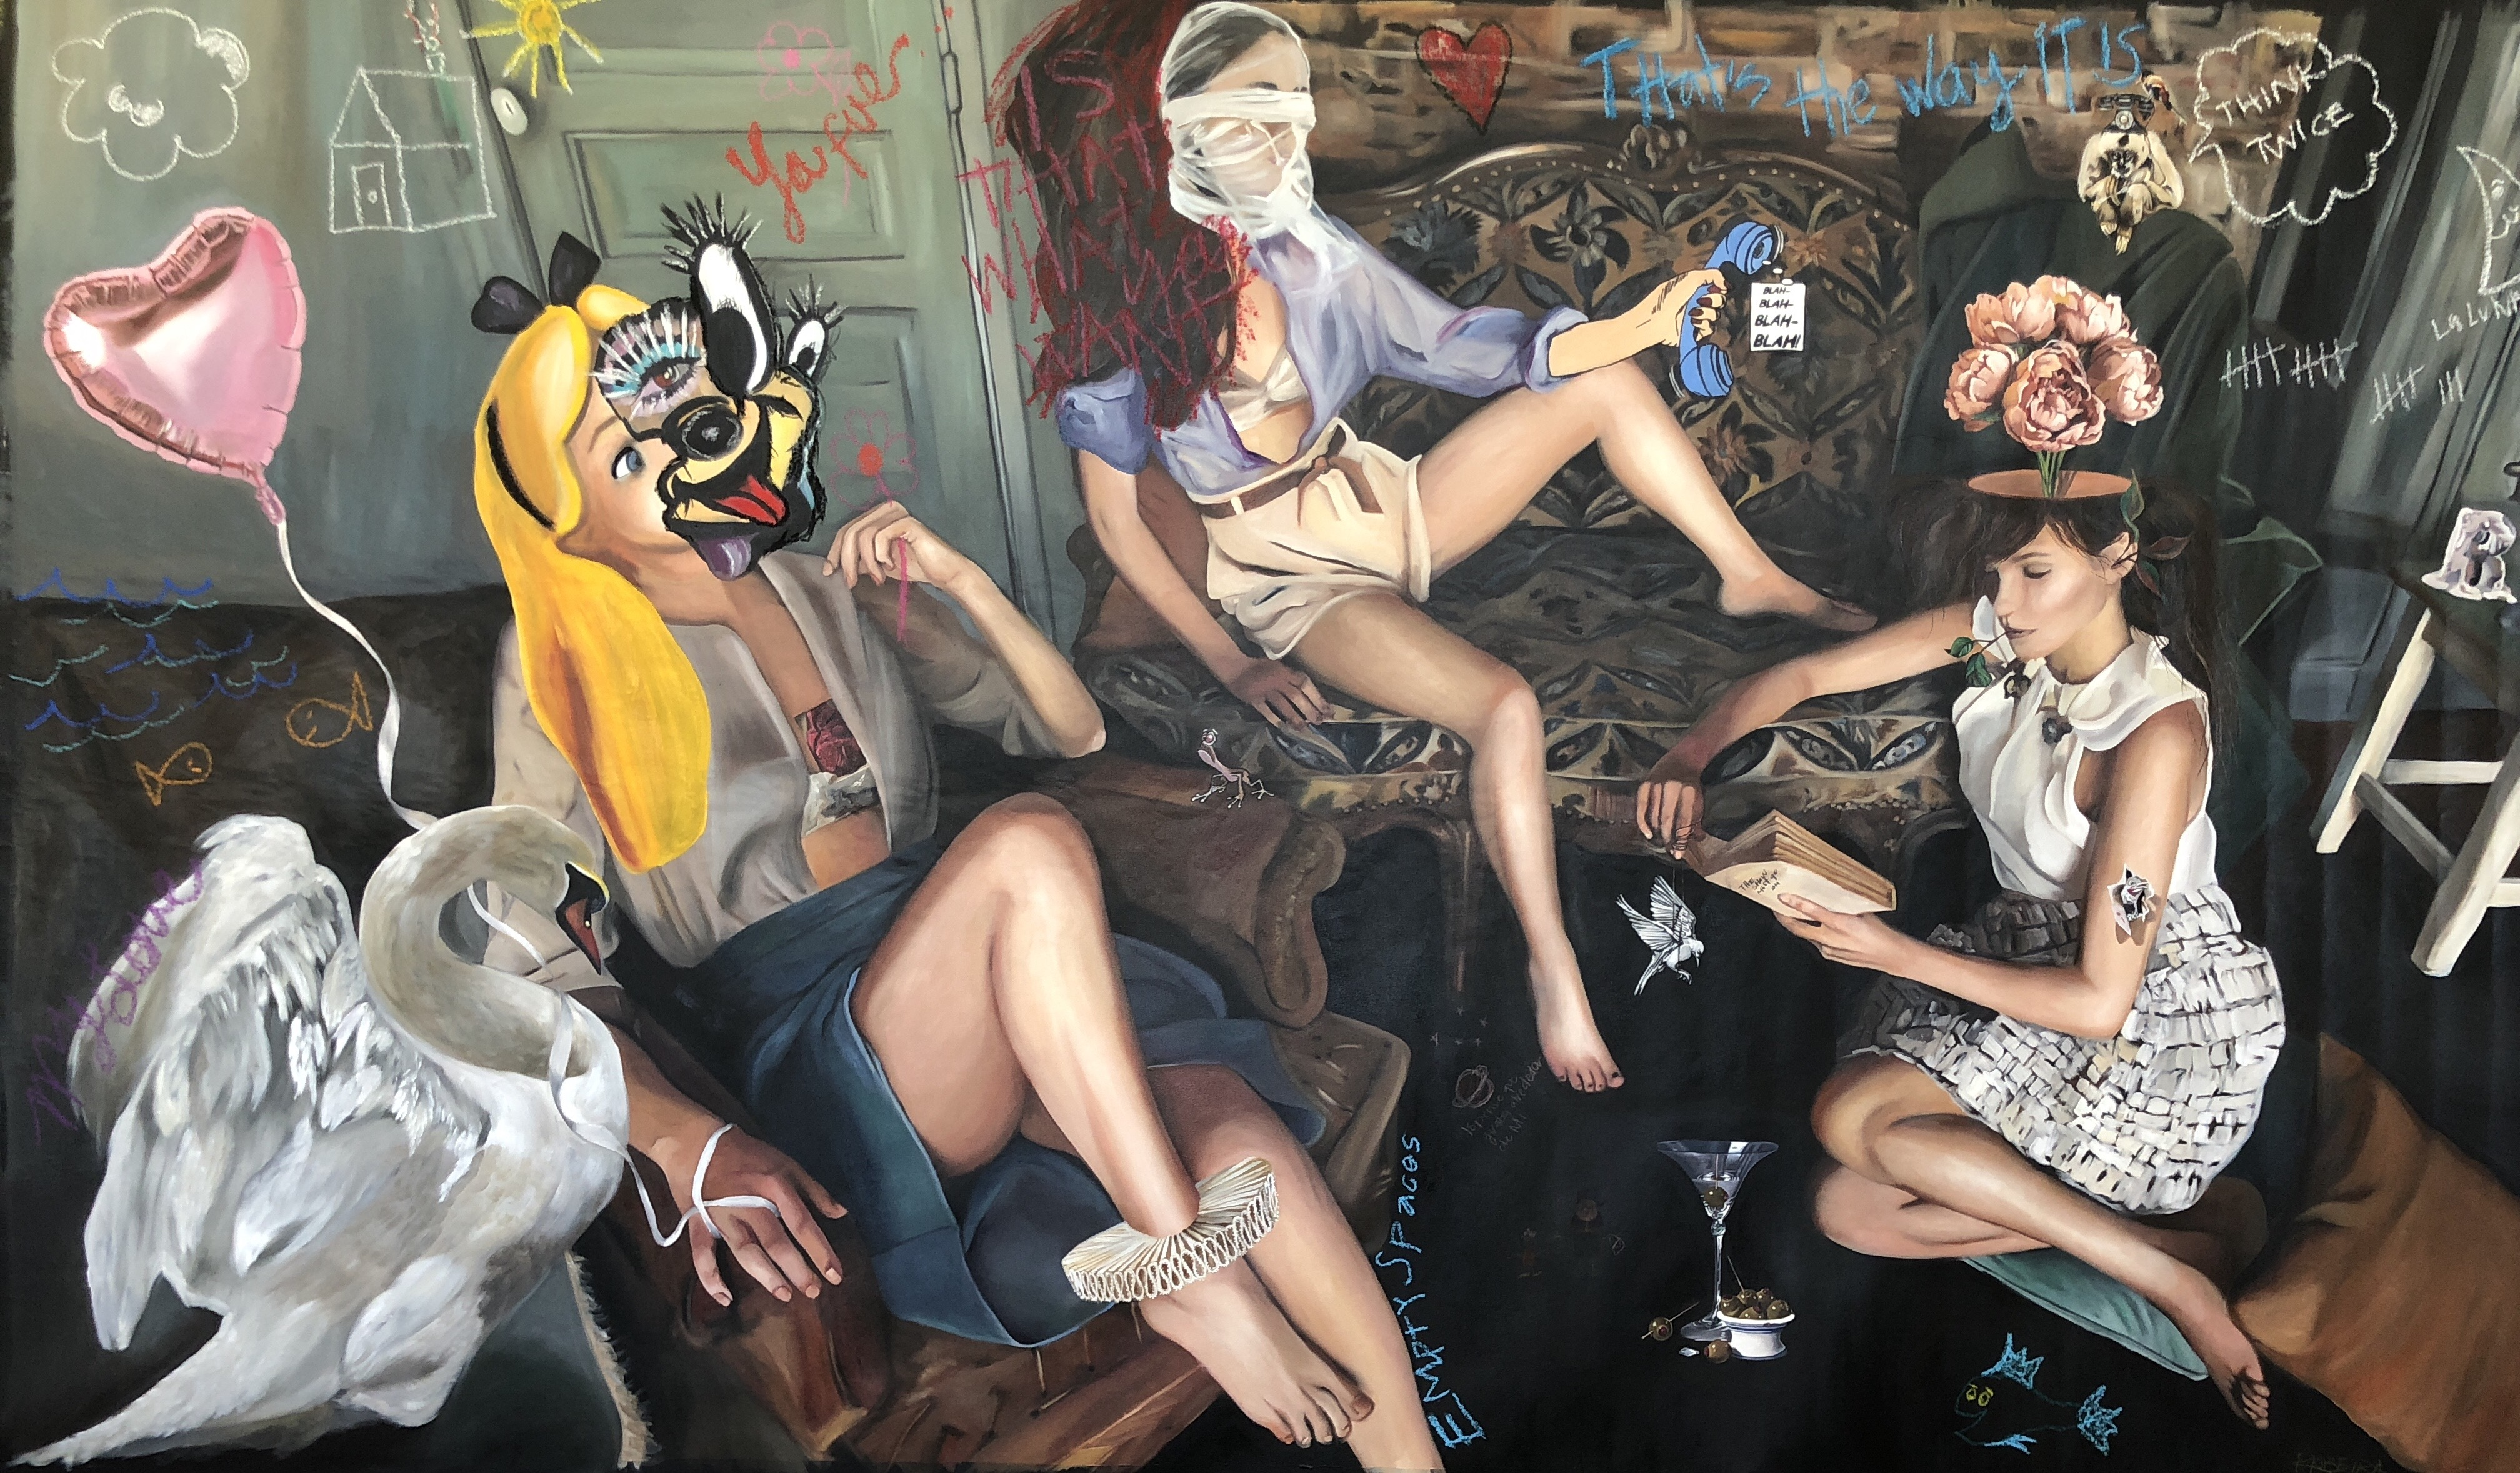 El destino maricón, óleo sobre tela, 2018.